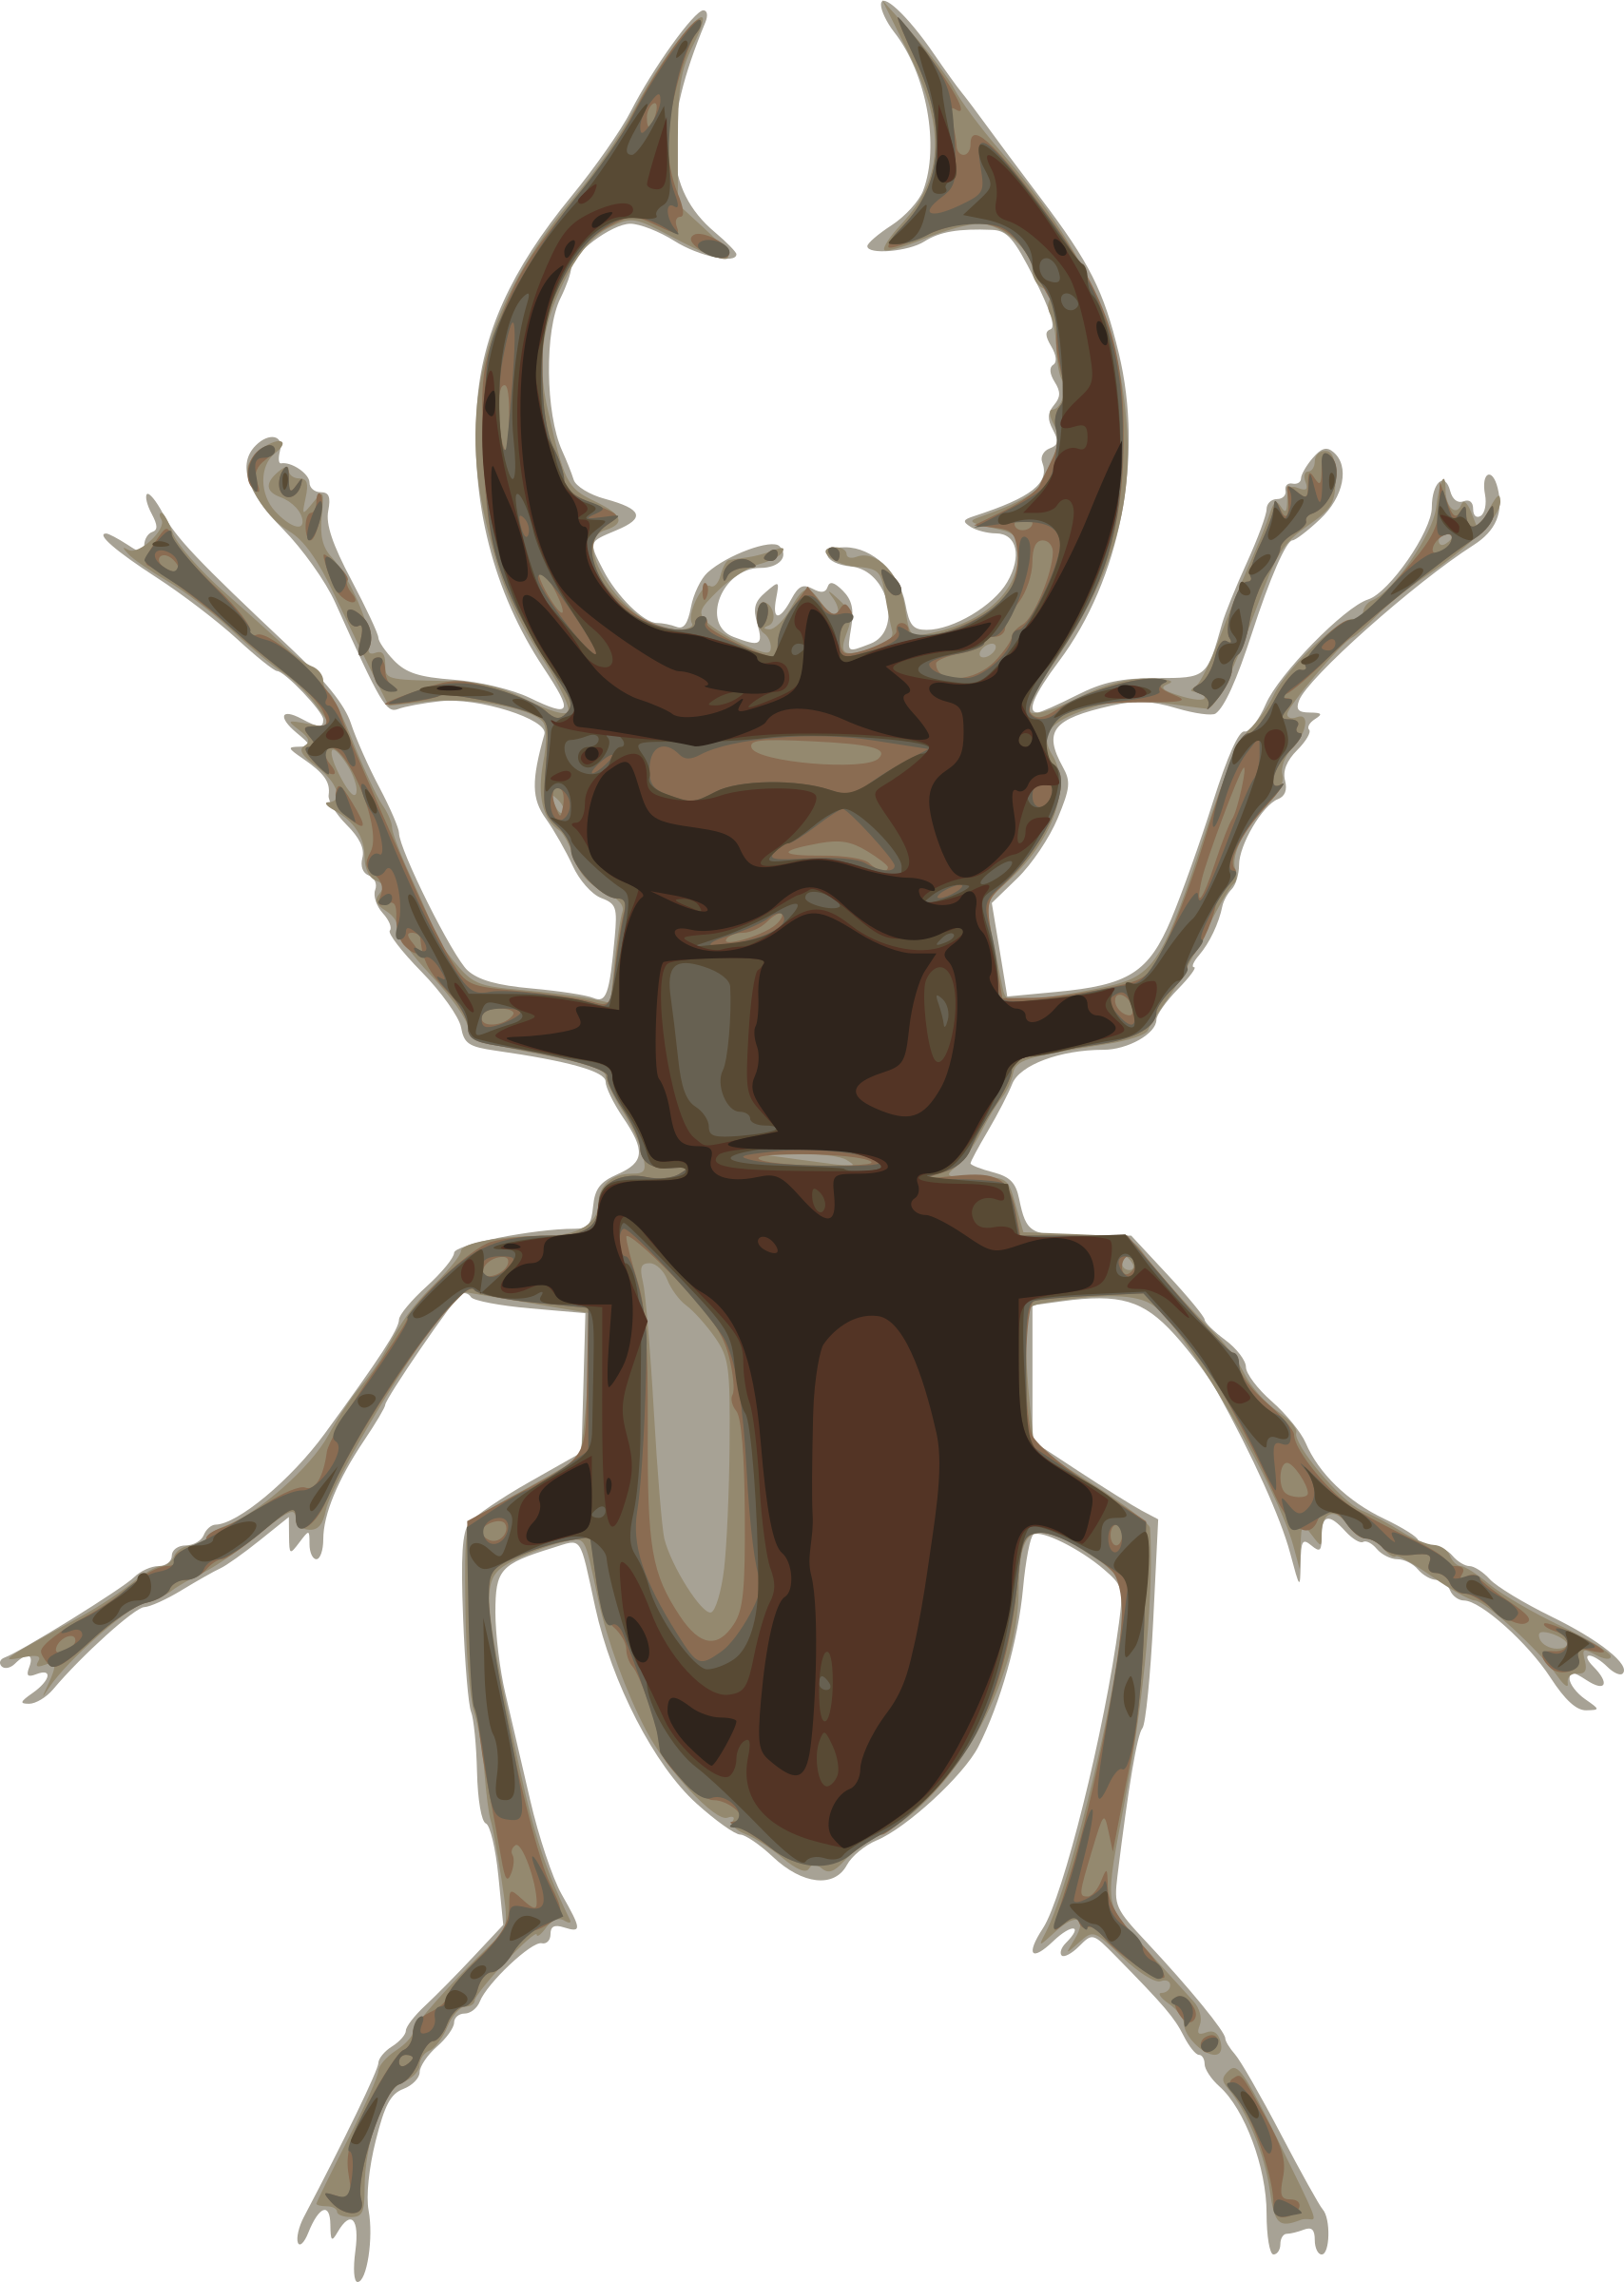 clipart transparent library Lucanus elephas big image. Beetle clipart stag beetle.